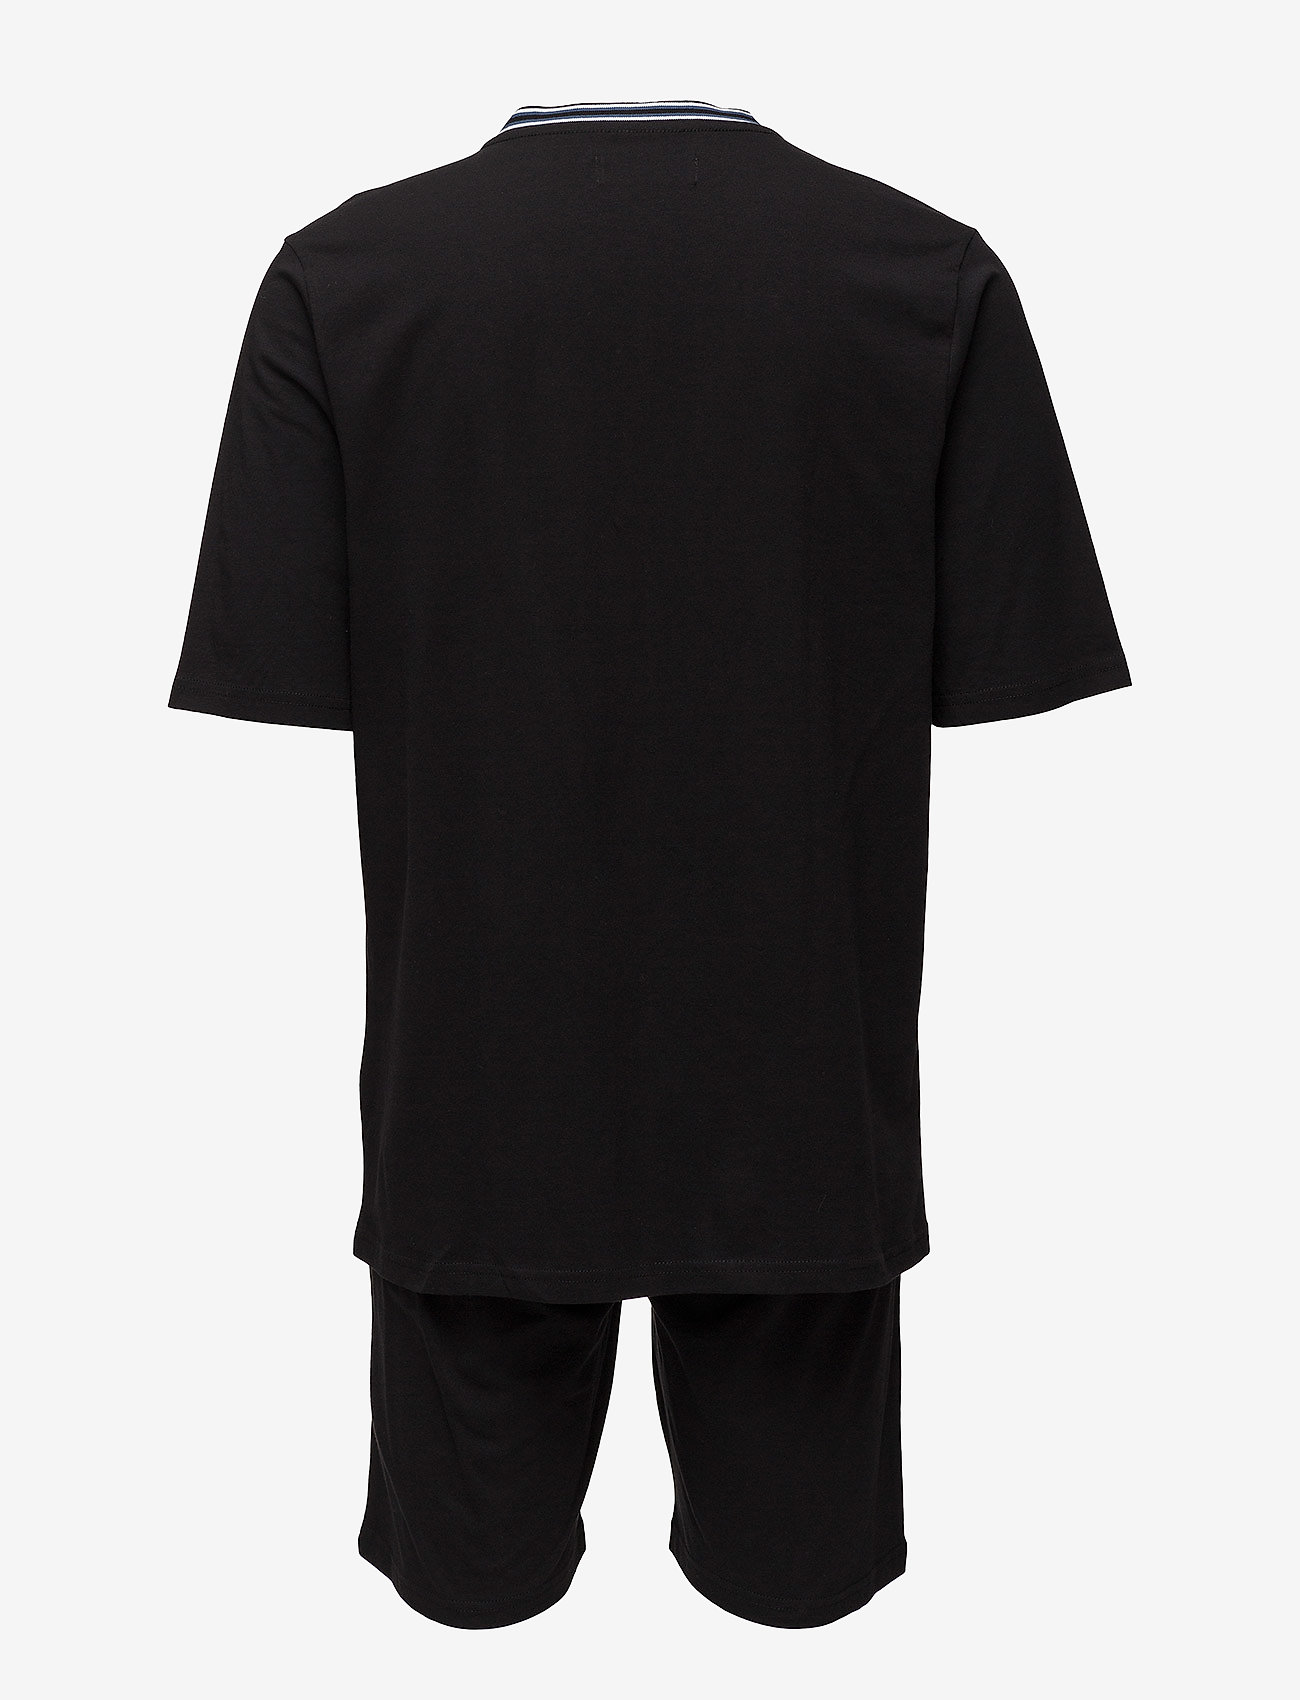 JBS - JBS pajamas, t-shirt-shorts - pyjamas - black - 1